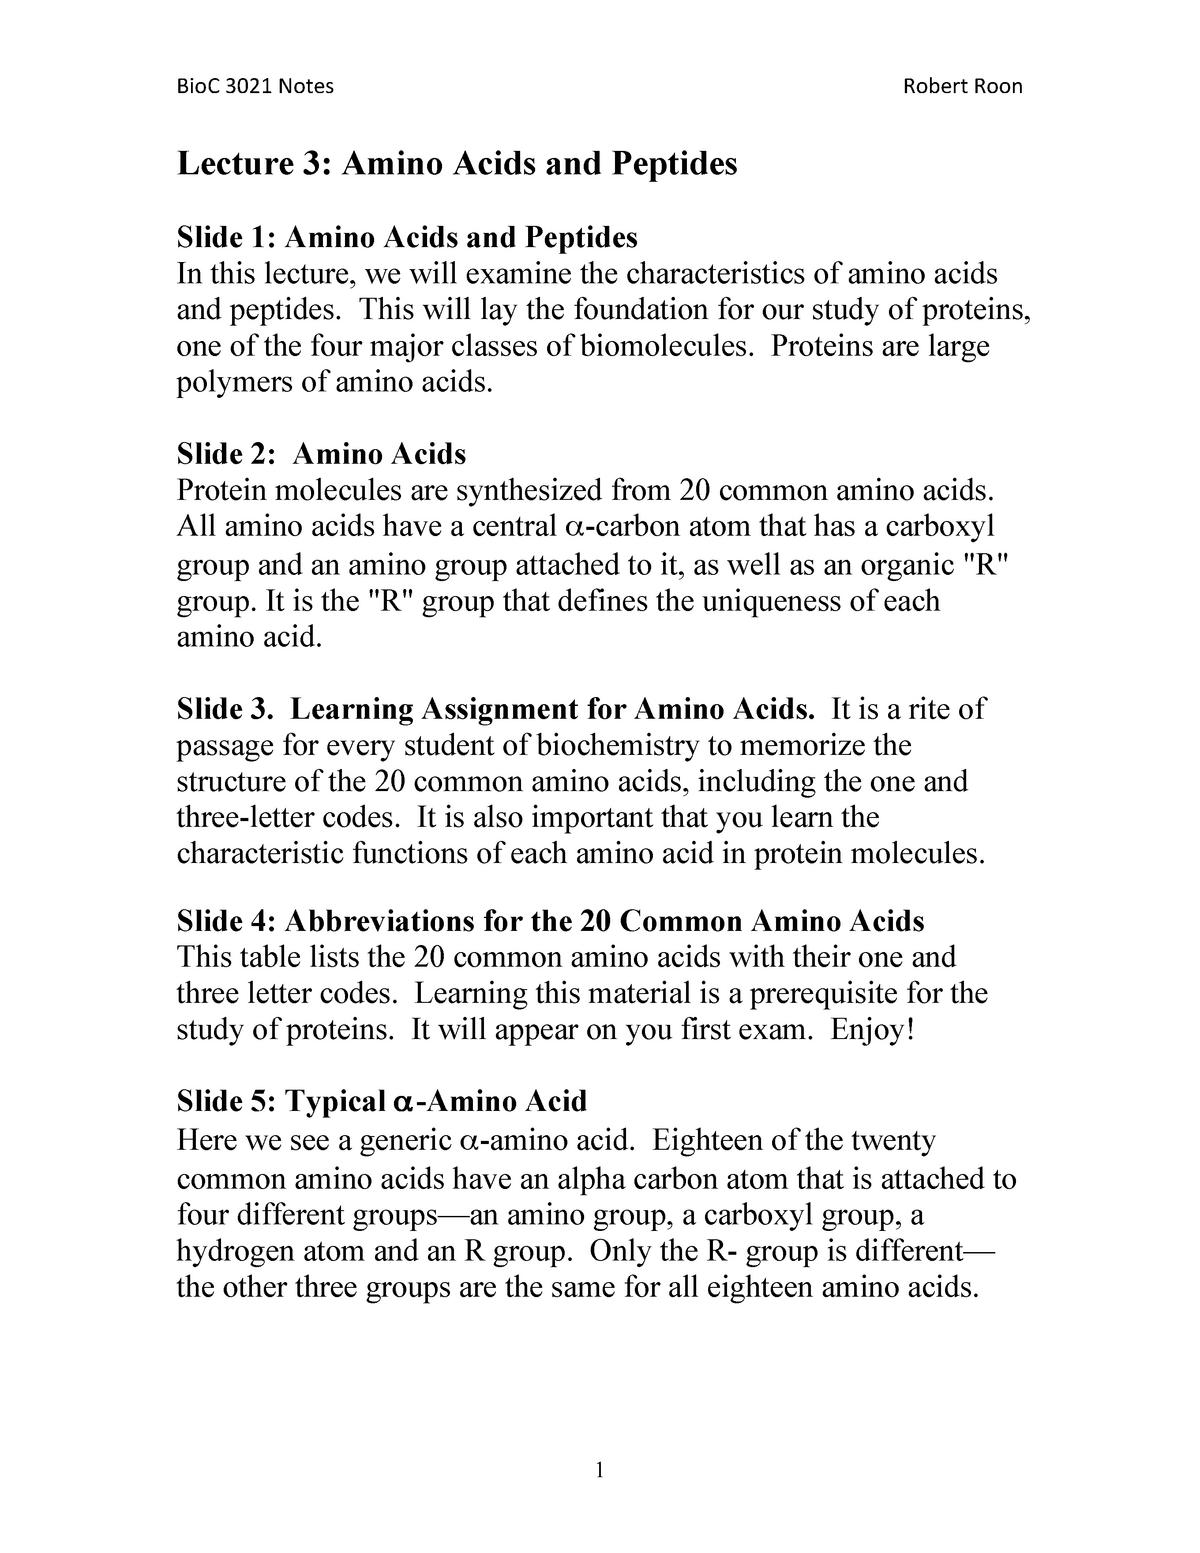 20 Amino Acid One Letter Code.Lecture 03 Amino Acids And Peptides Bioc 3021 Biochemistry